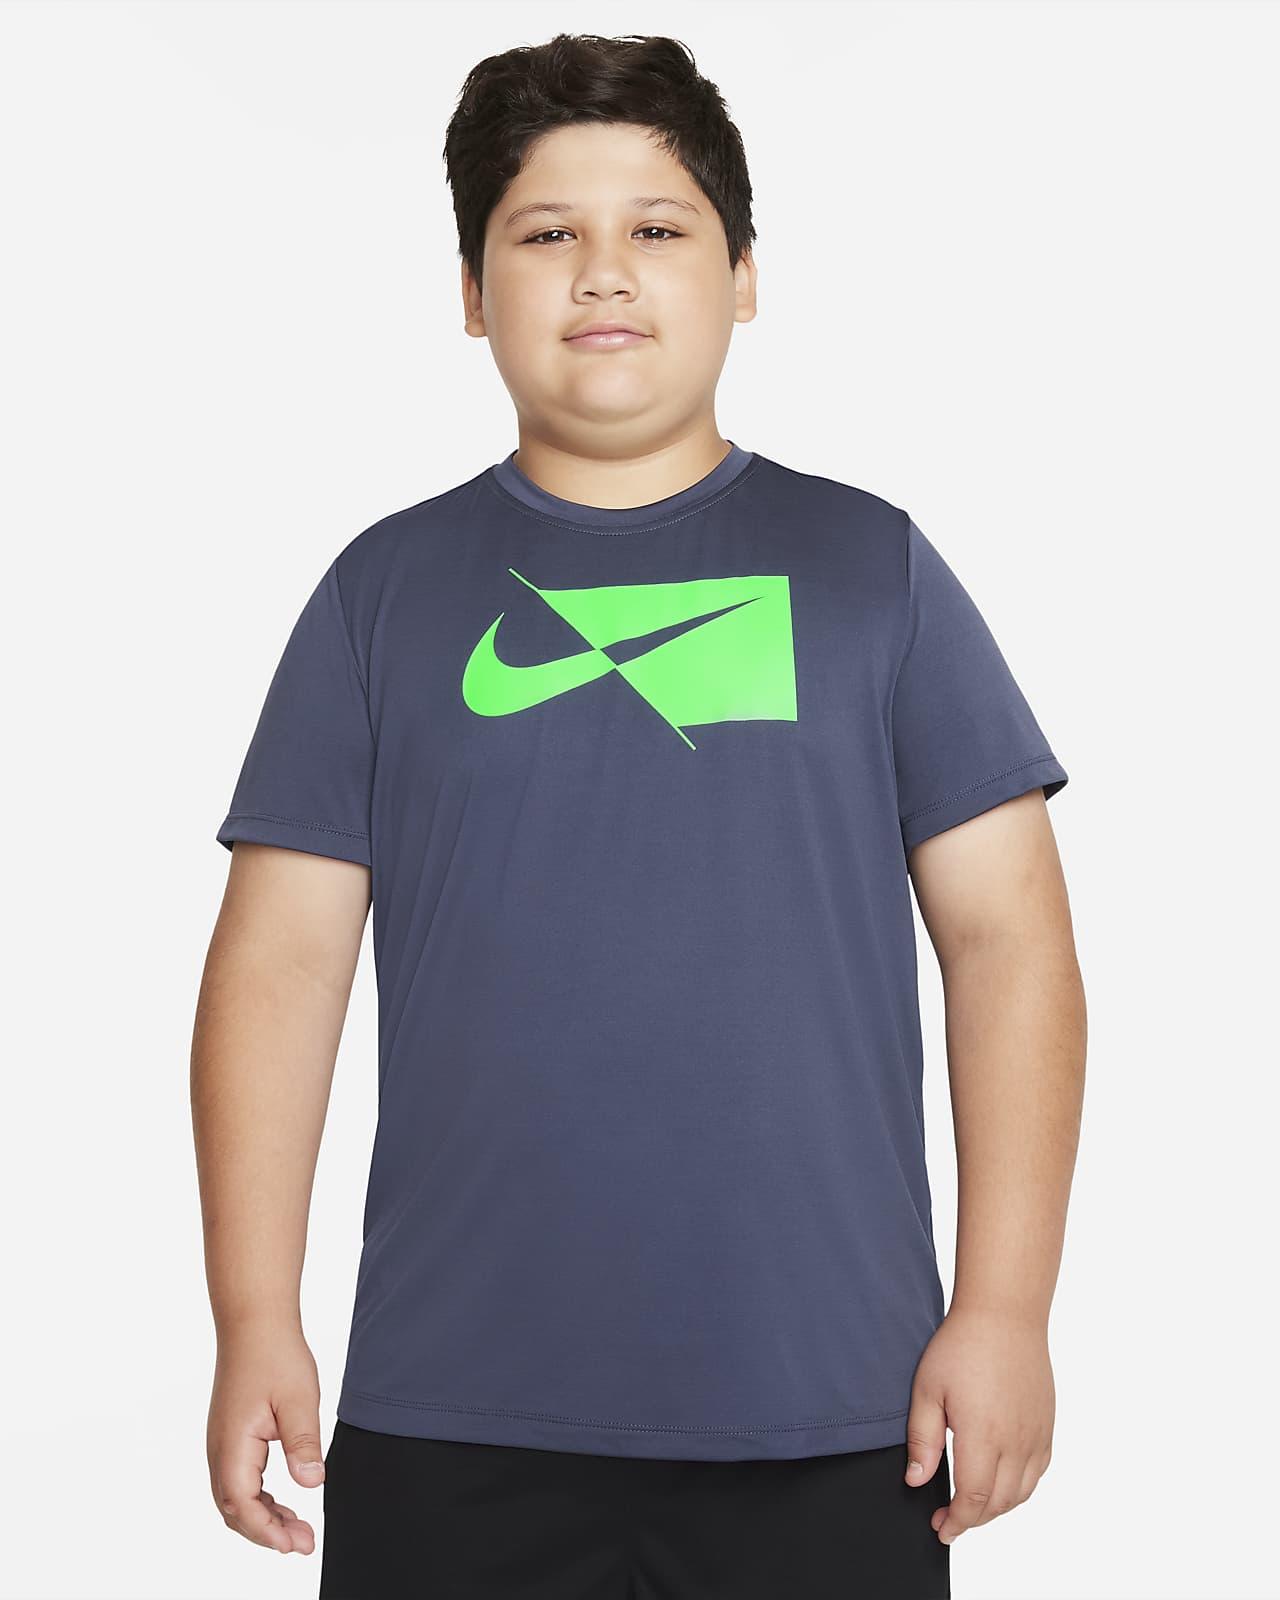 Camiseta de entrenamiento de manga corta para niños talla grande Nike (talla extendida)